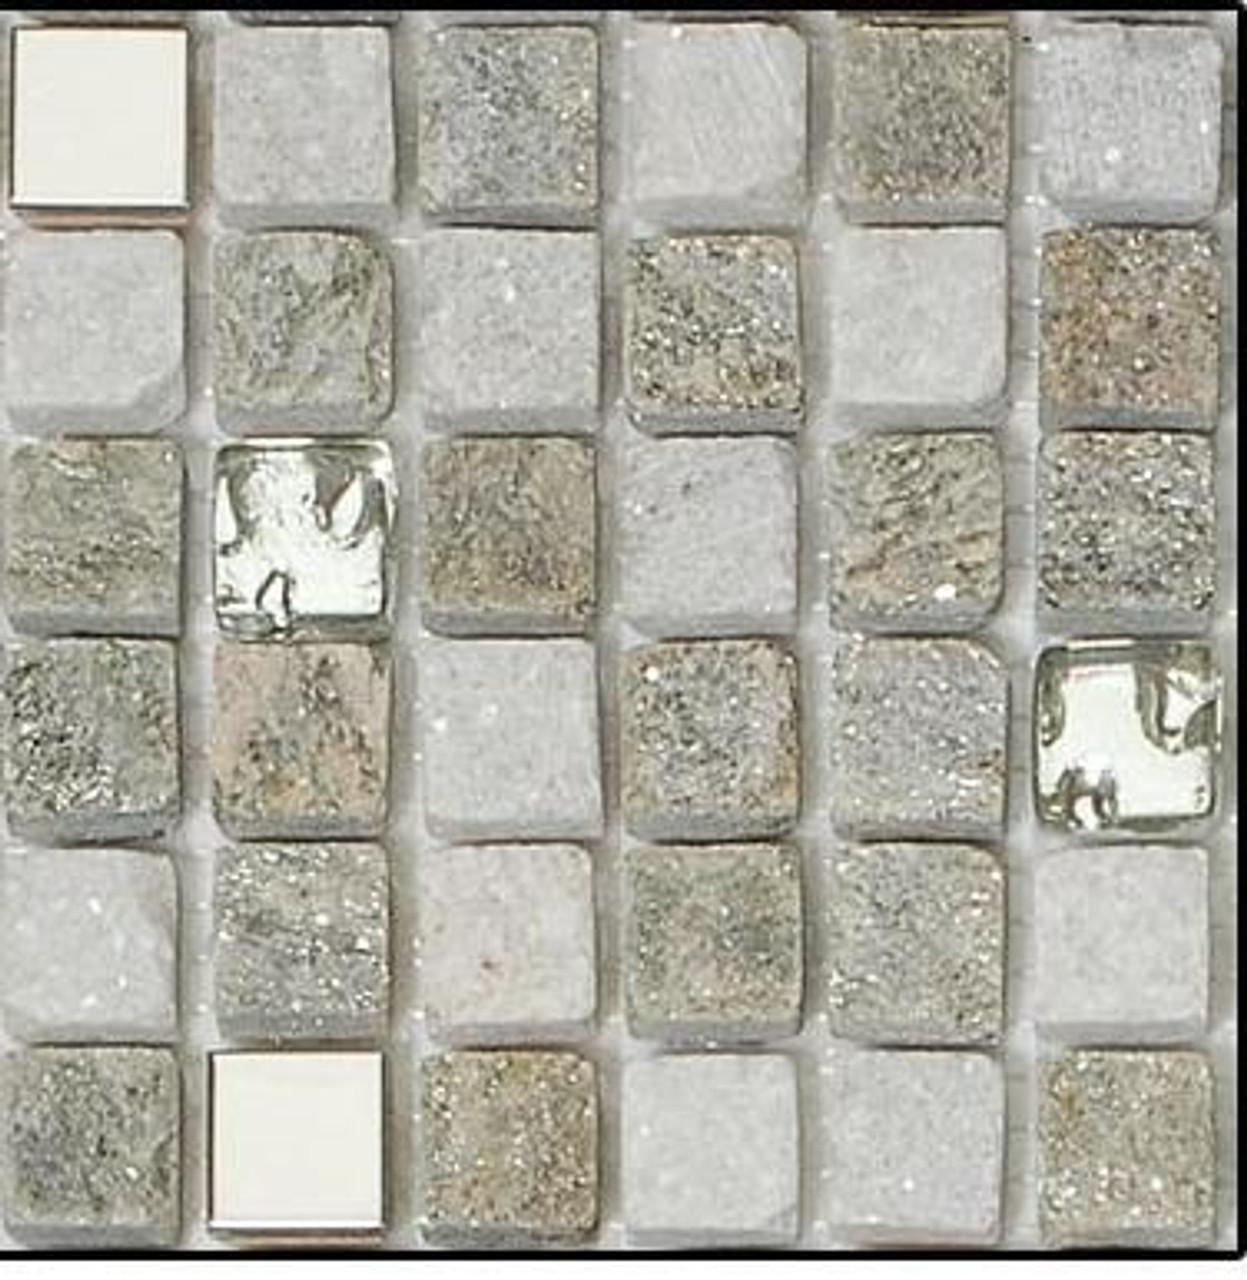 Bella Glass Tiles Opulence 5/8 x 5/8 Mosaic Series Flint Smoke